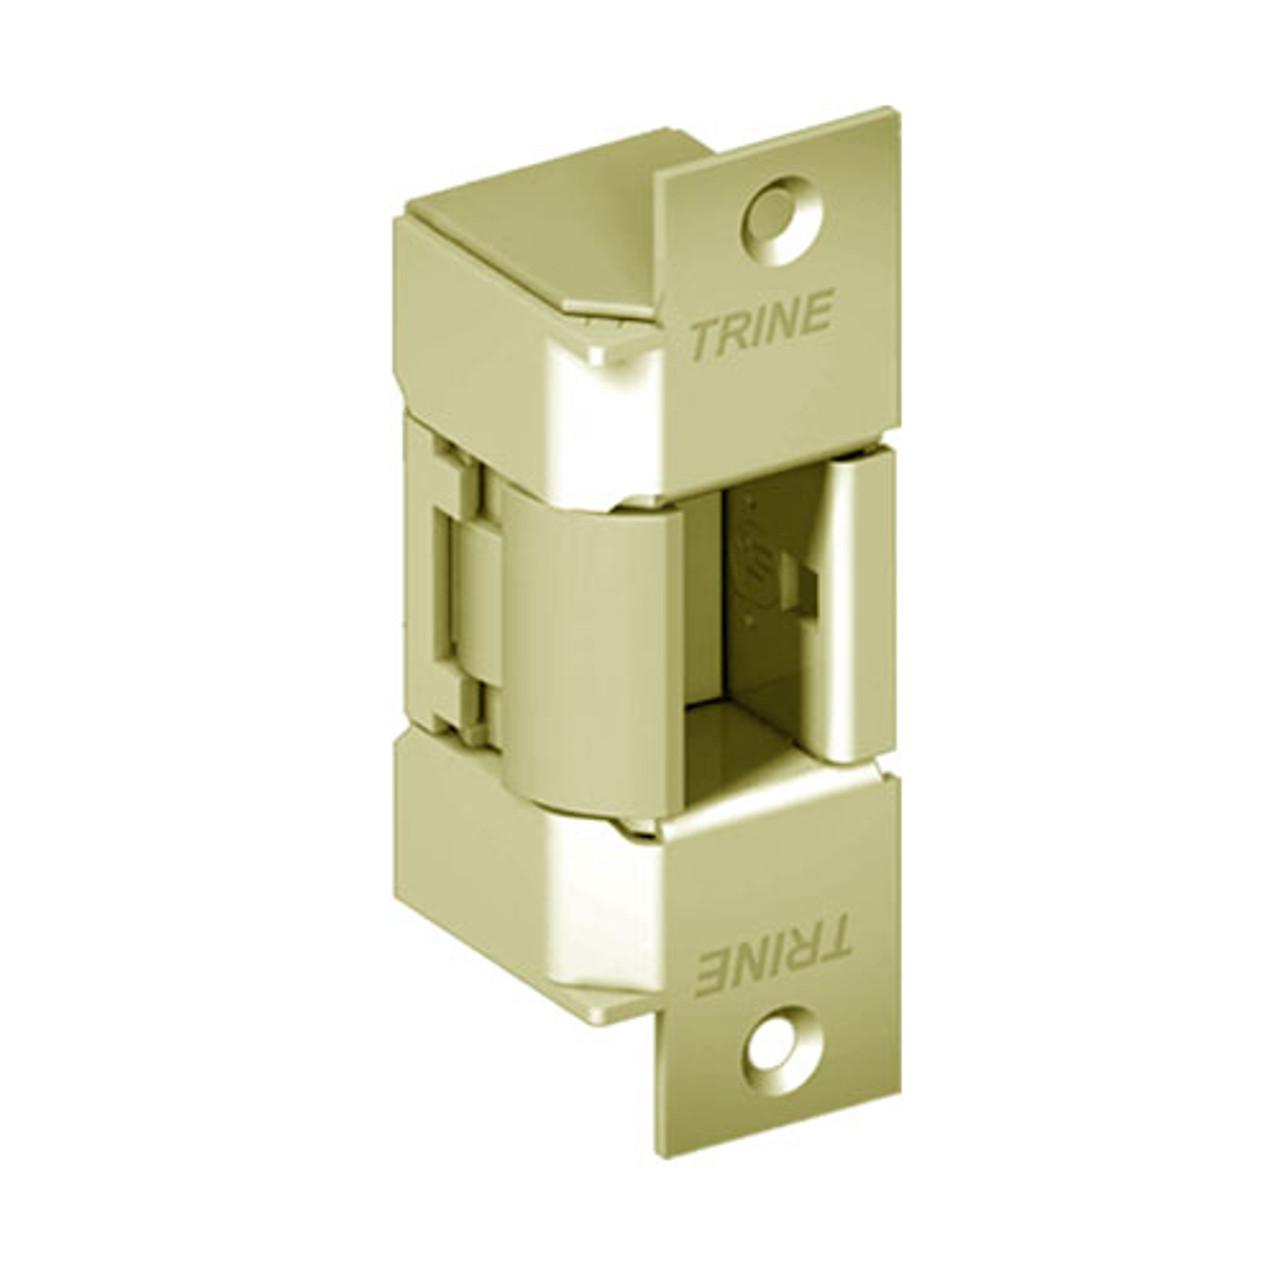 EN400-12DC-US4-RH Trine EN Series Outdoor Electric Strikes Solution in Satin Brass Finish